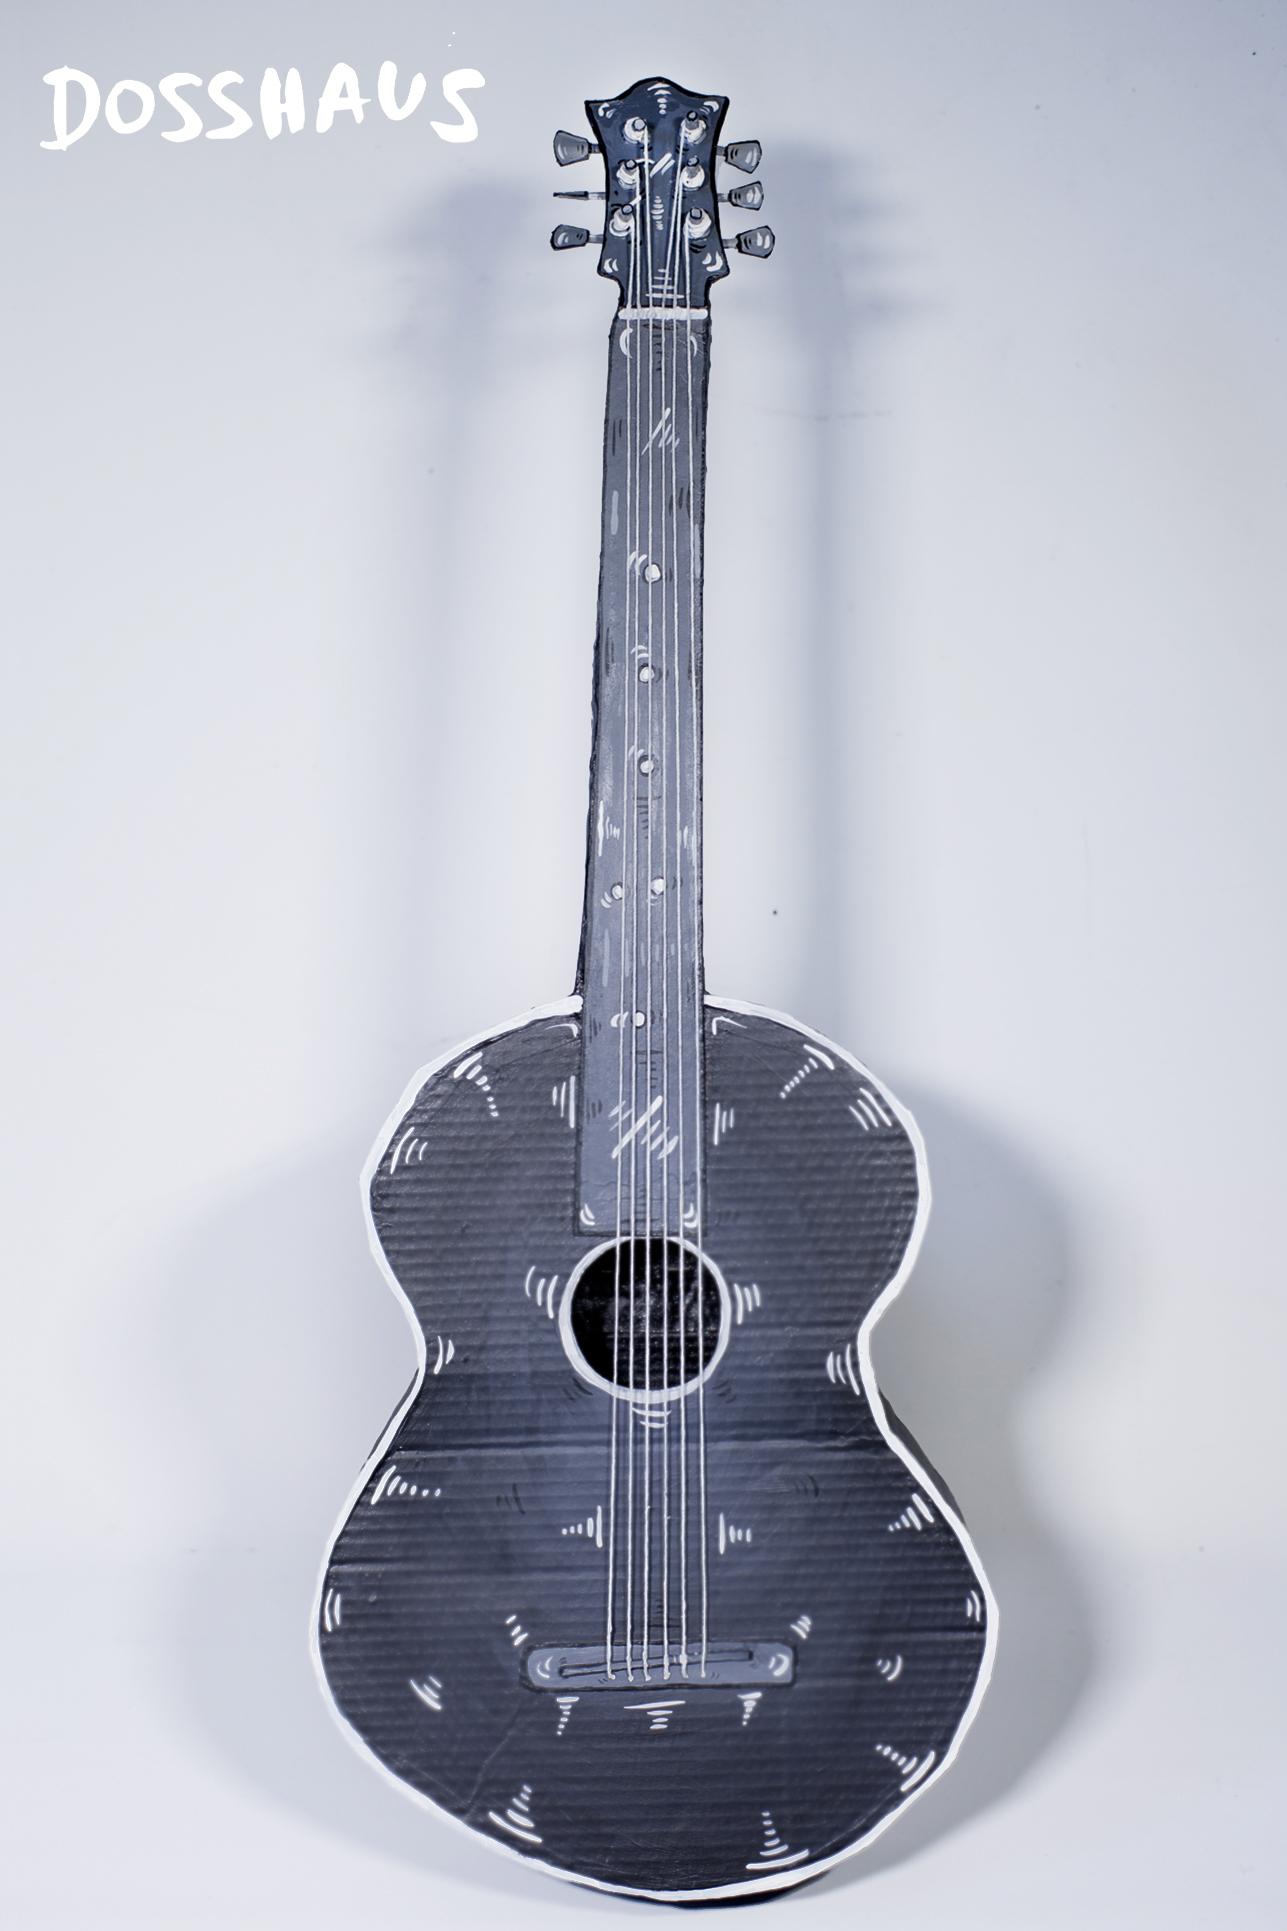 Dosshaus Accoustic Guitar 1.jpg